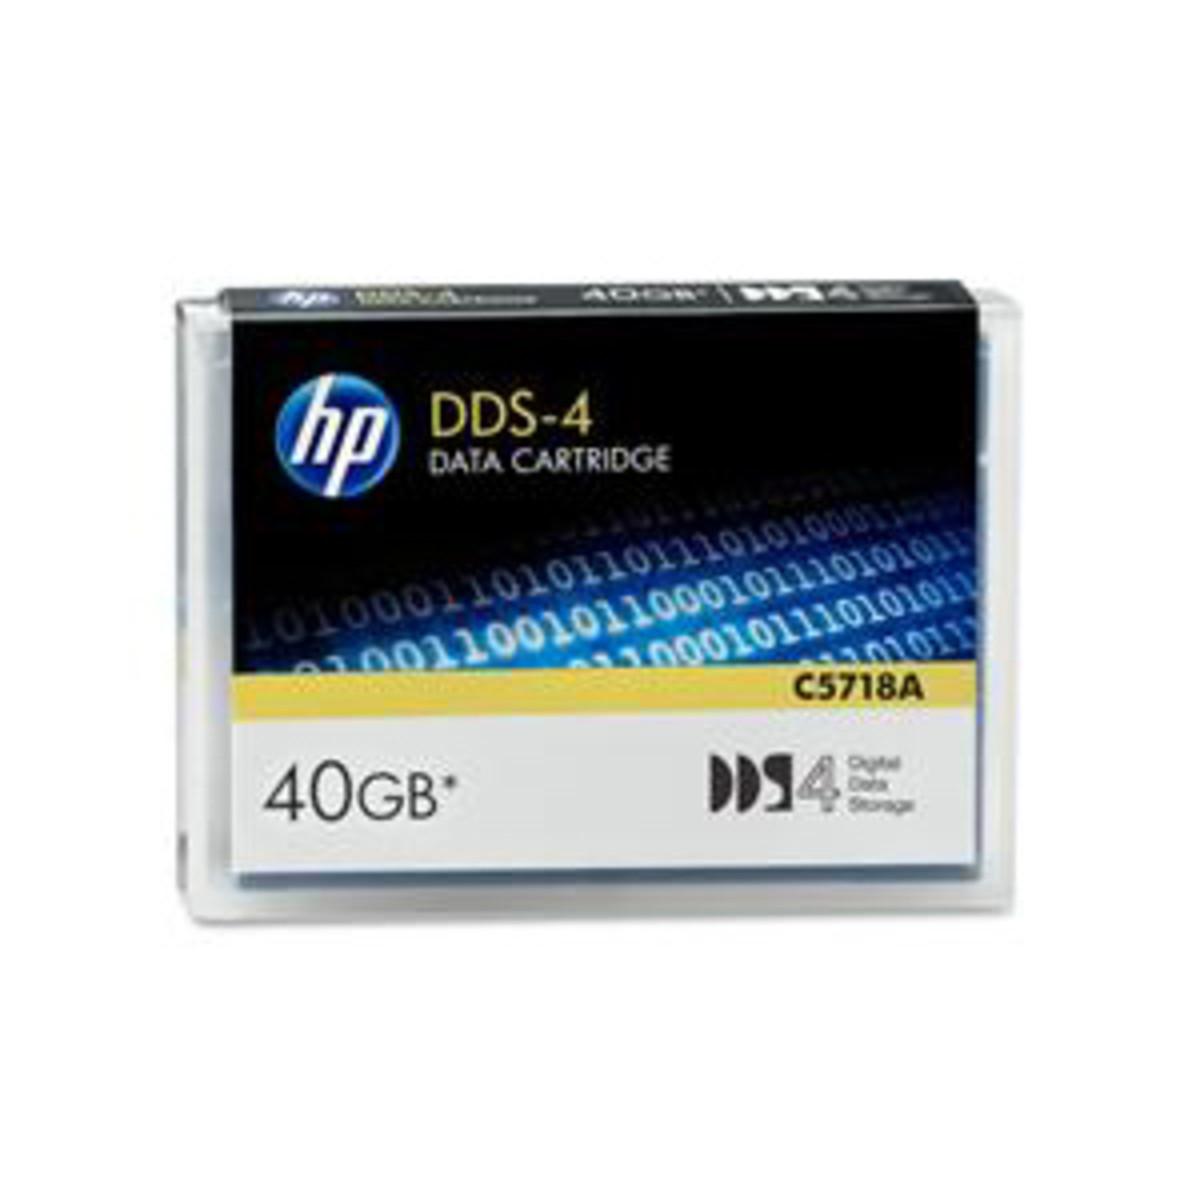 HP DDS 4 Data Cartridge 40GB/150M